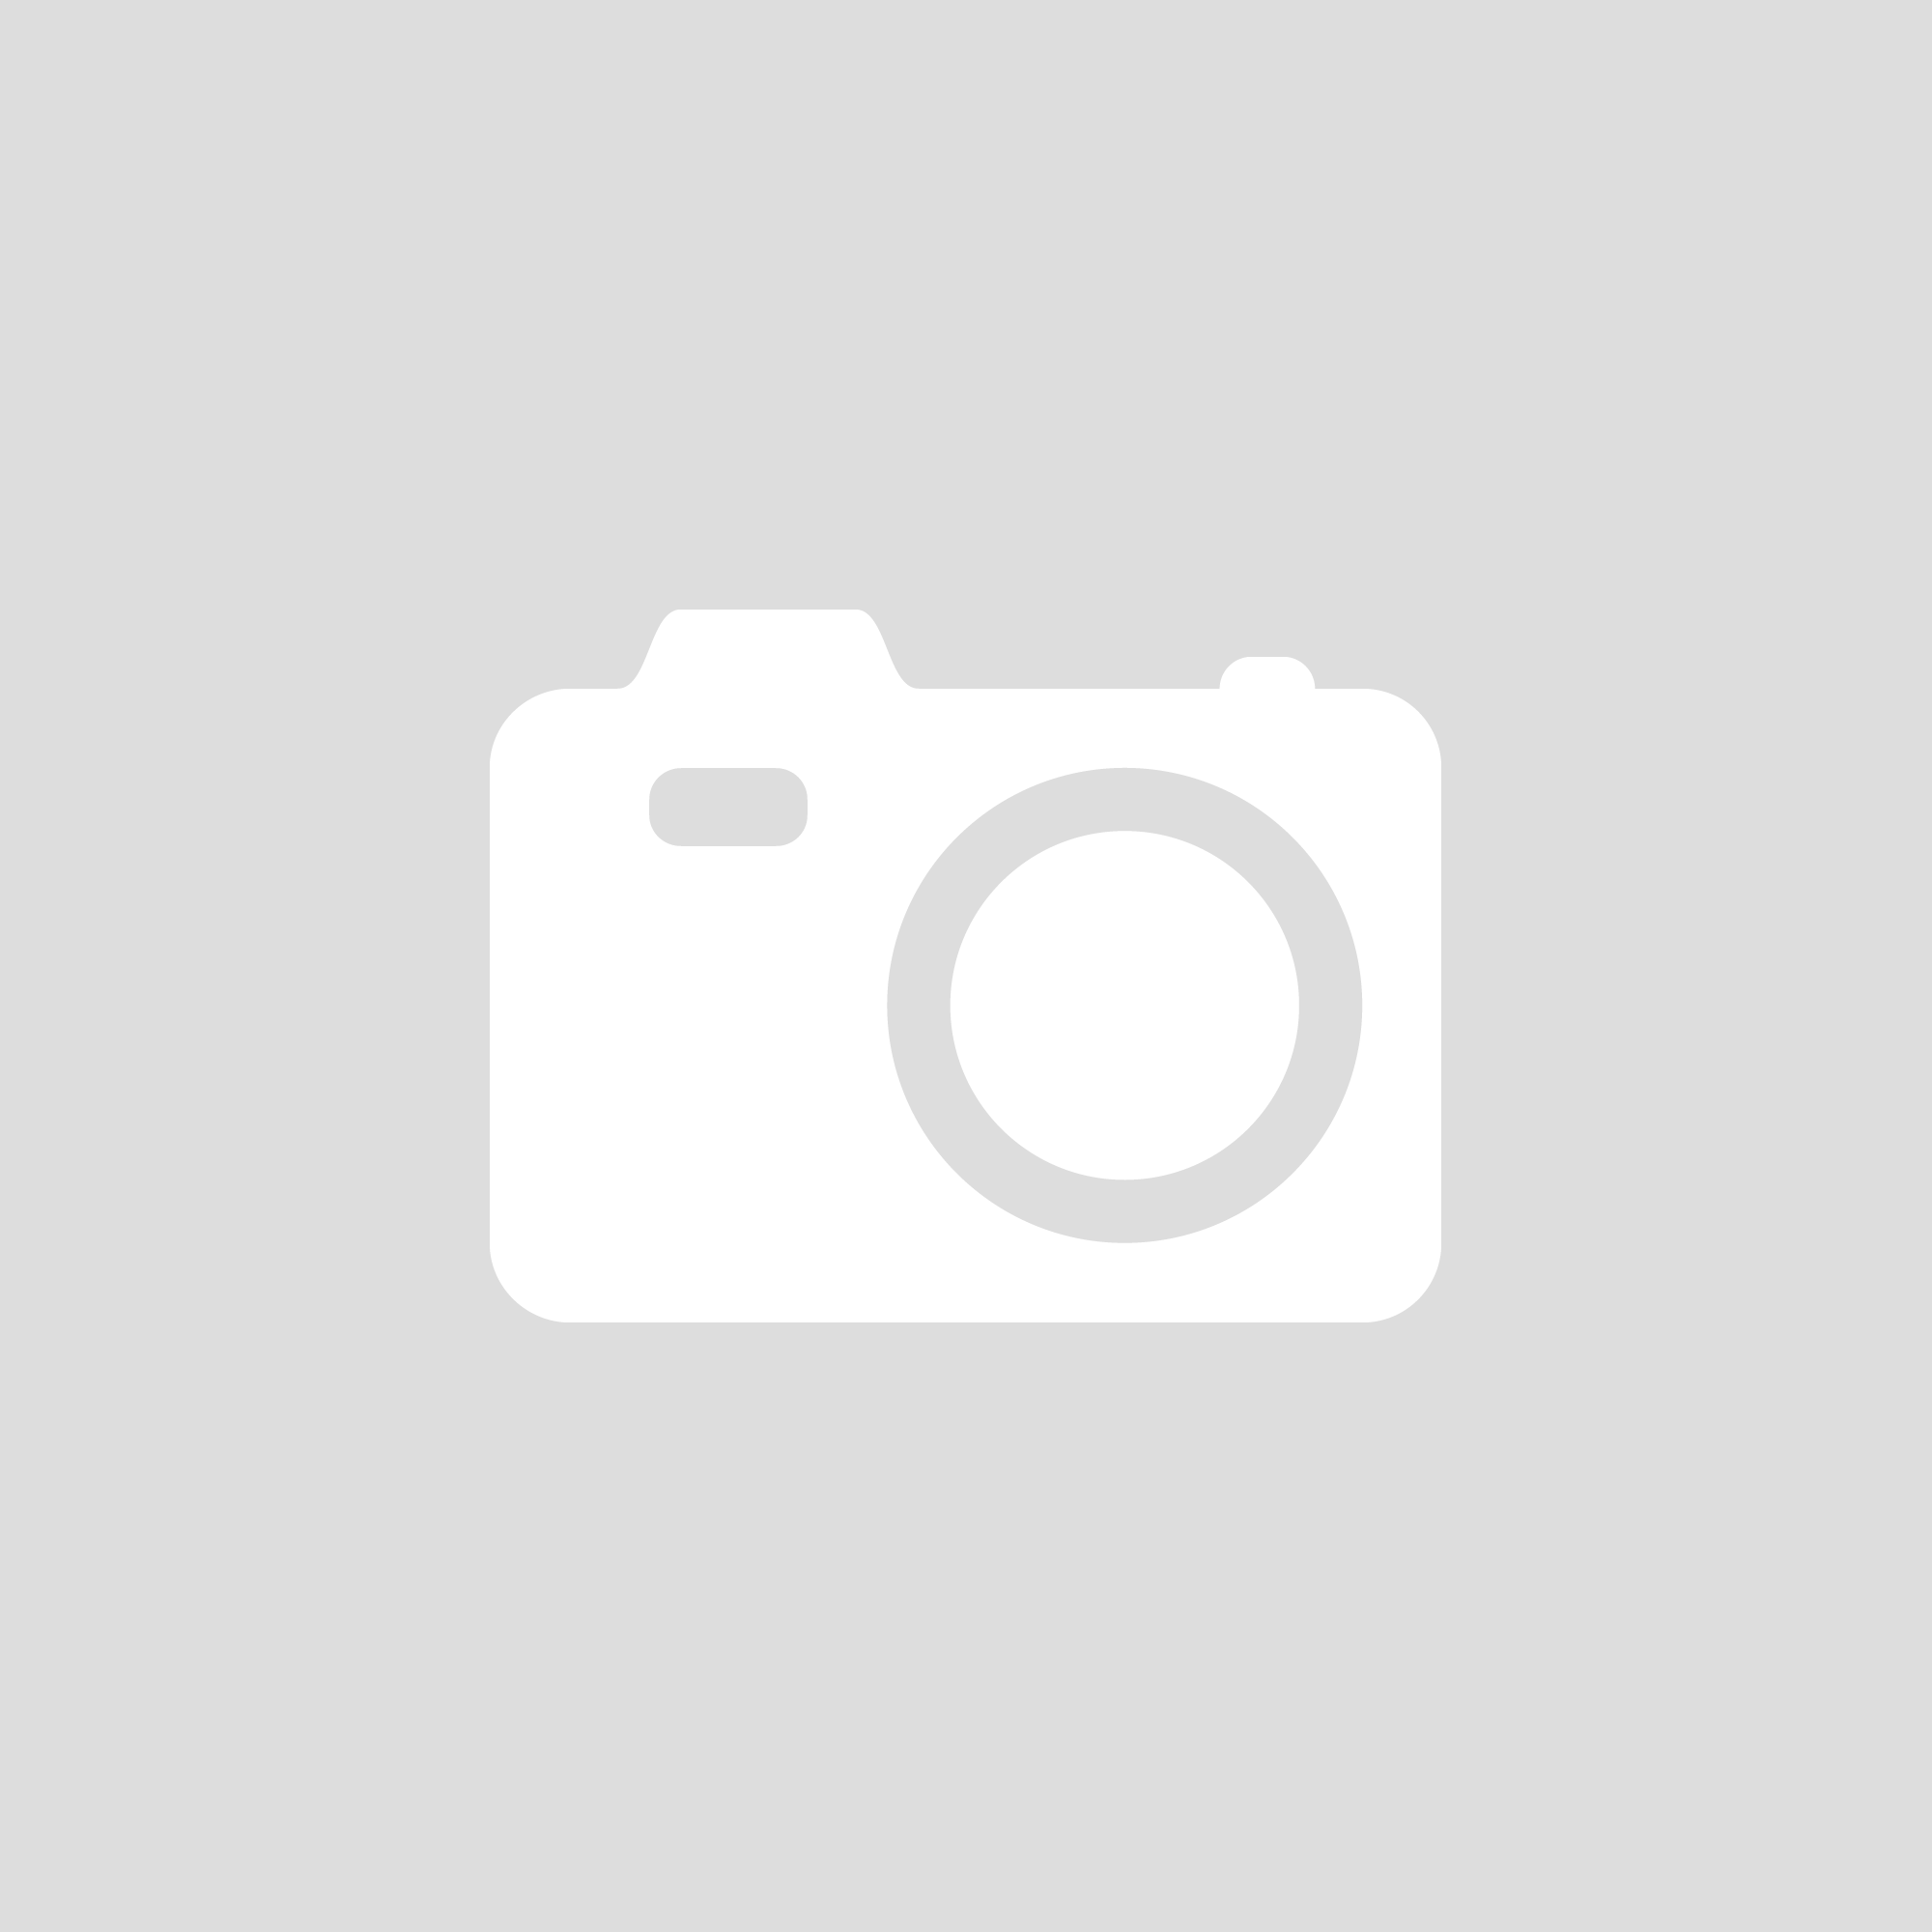 Kyria Rose Plum Cushion by Thomas Frederick 31061